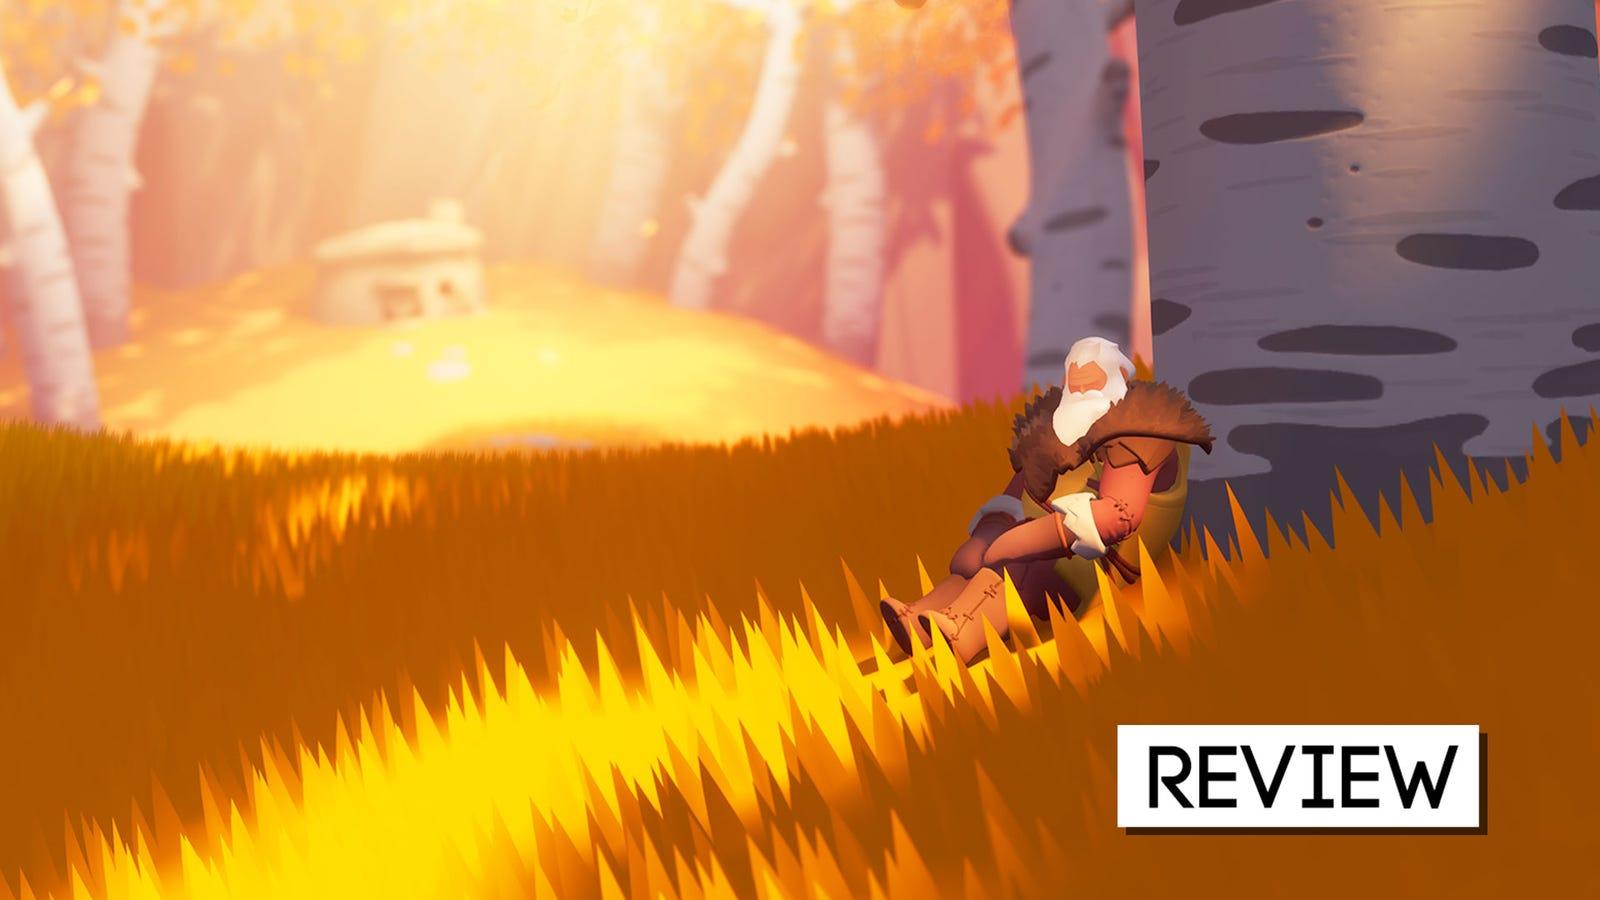 Arise: A Simple Story: The Kotaku Review